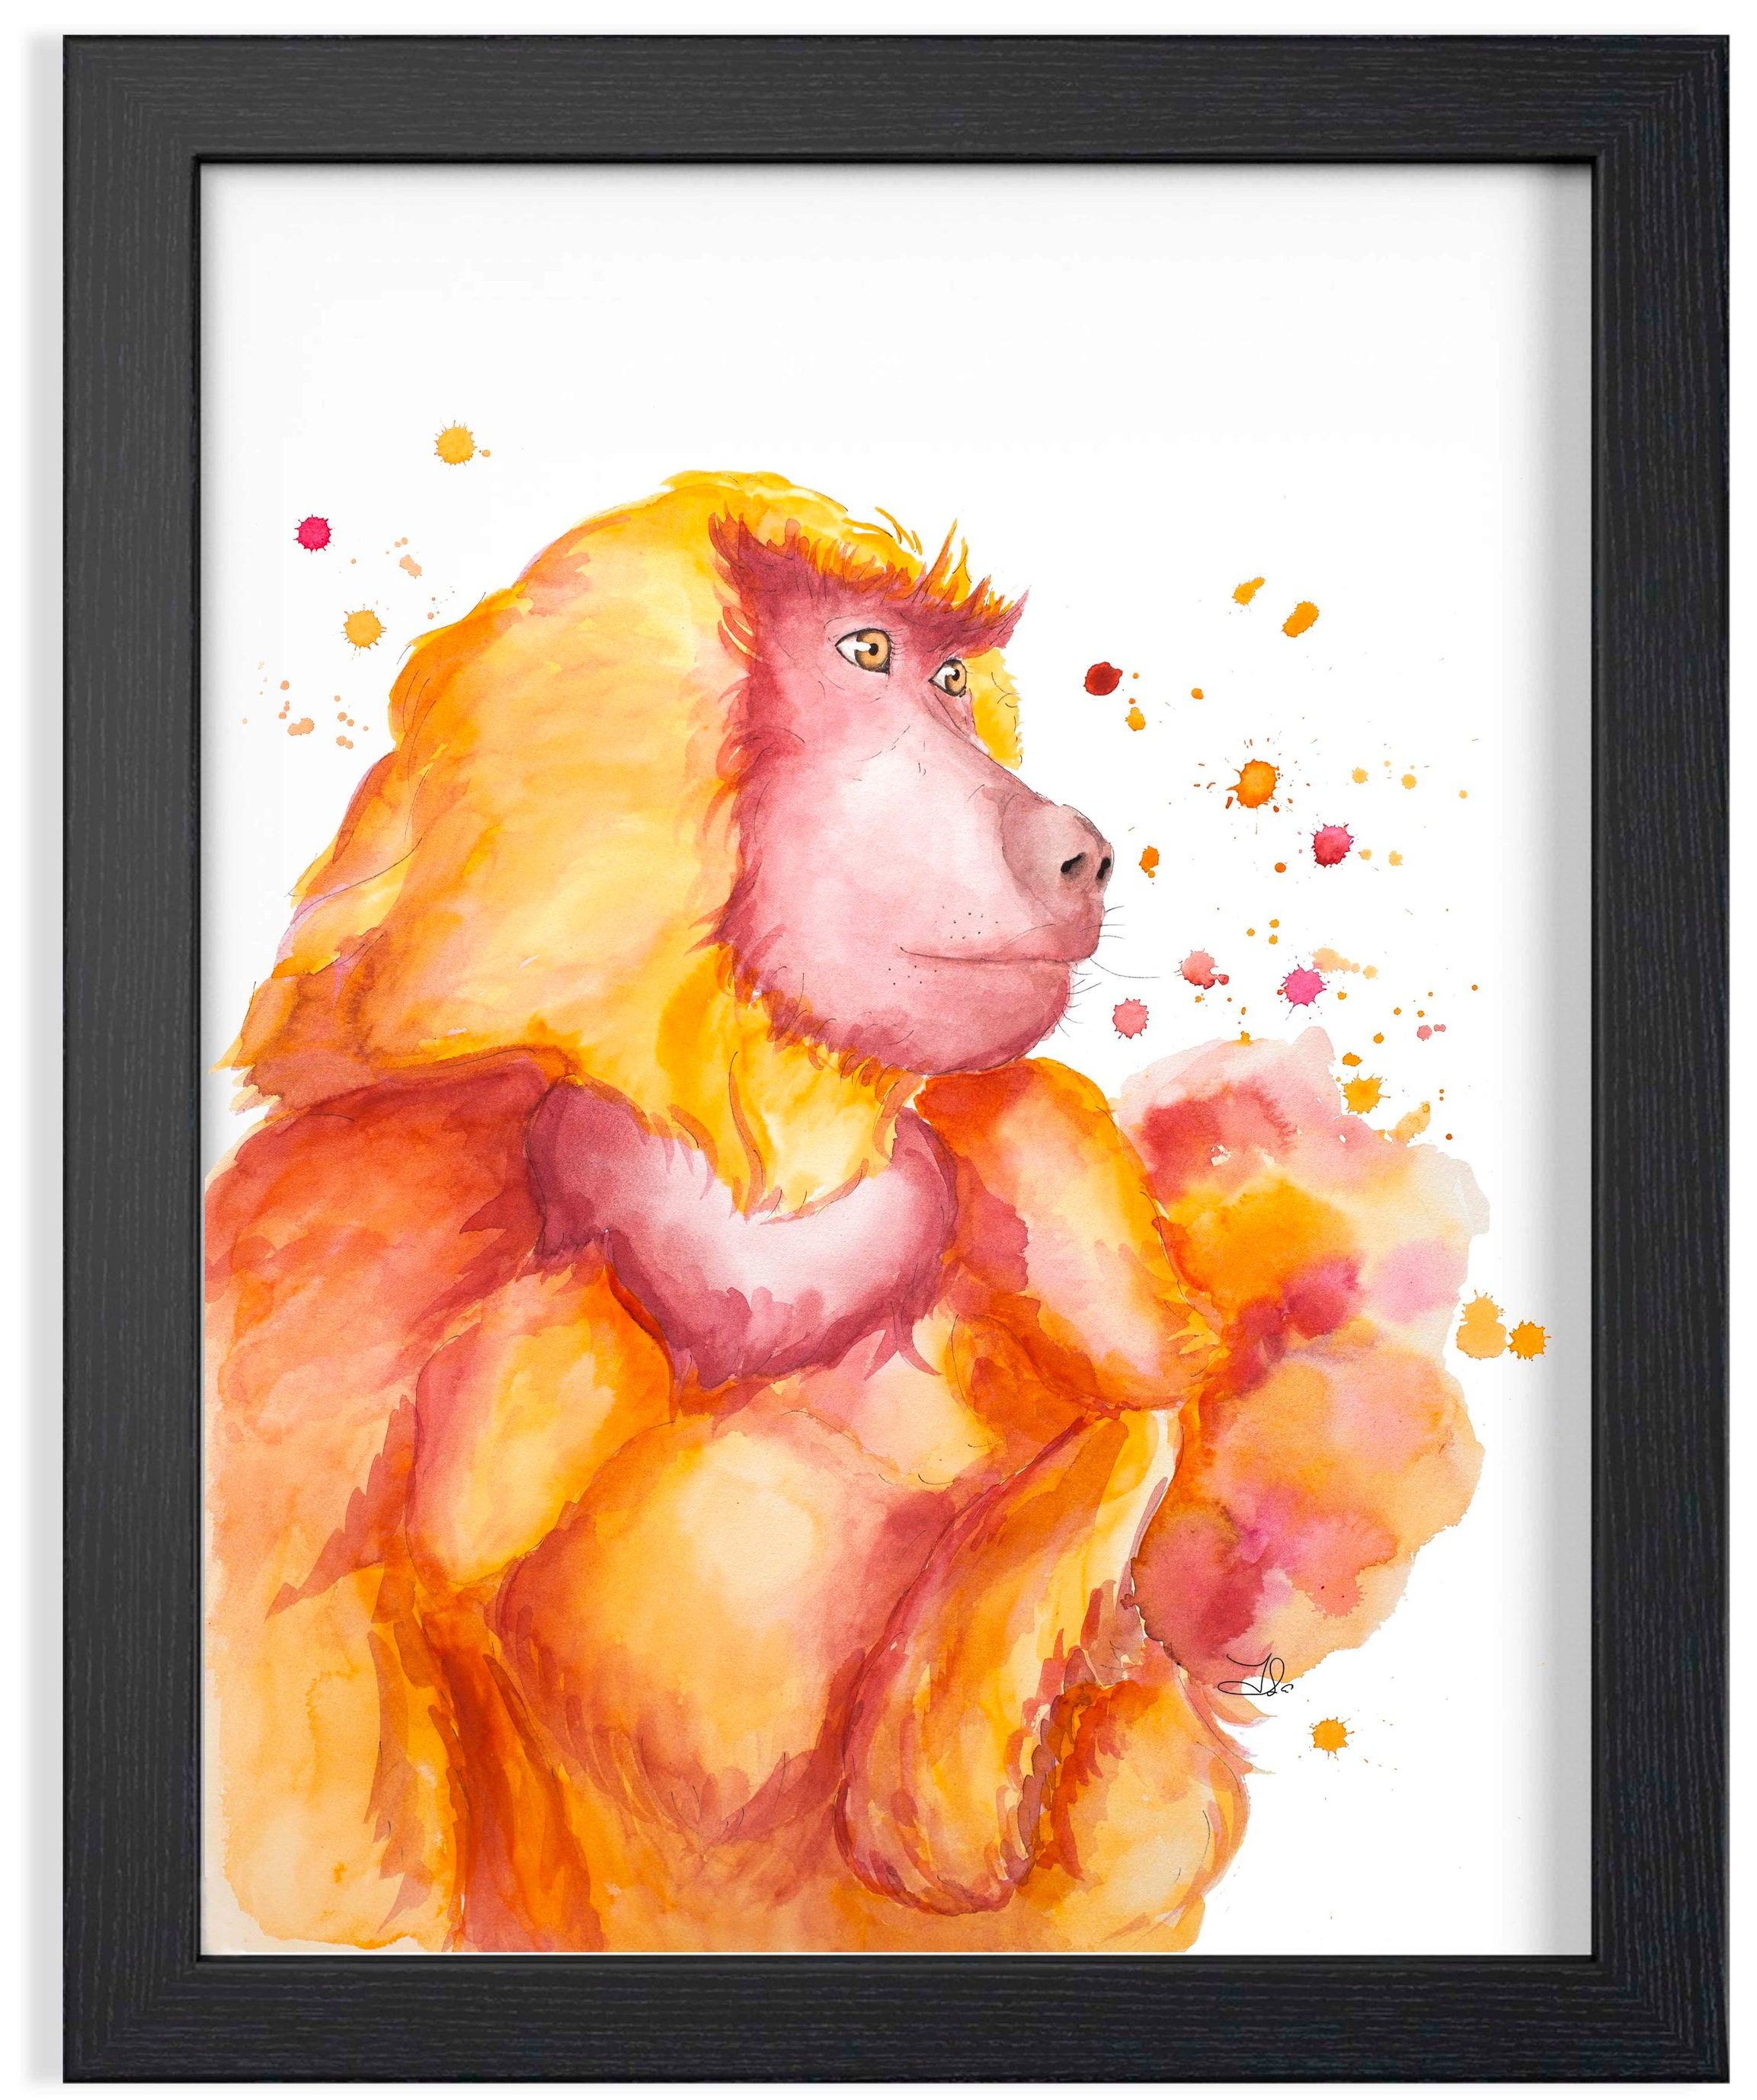 "Chrissy Baboon Watercolor Portrait  269. 00 $CA Fabriano Artistico 100% Cotton  Original watercolor painting 18 x 22"" (46 x 56 cm)"